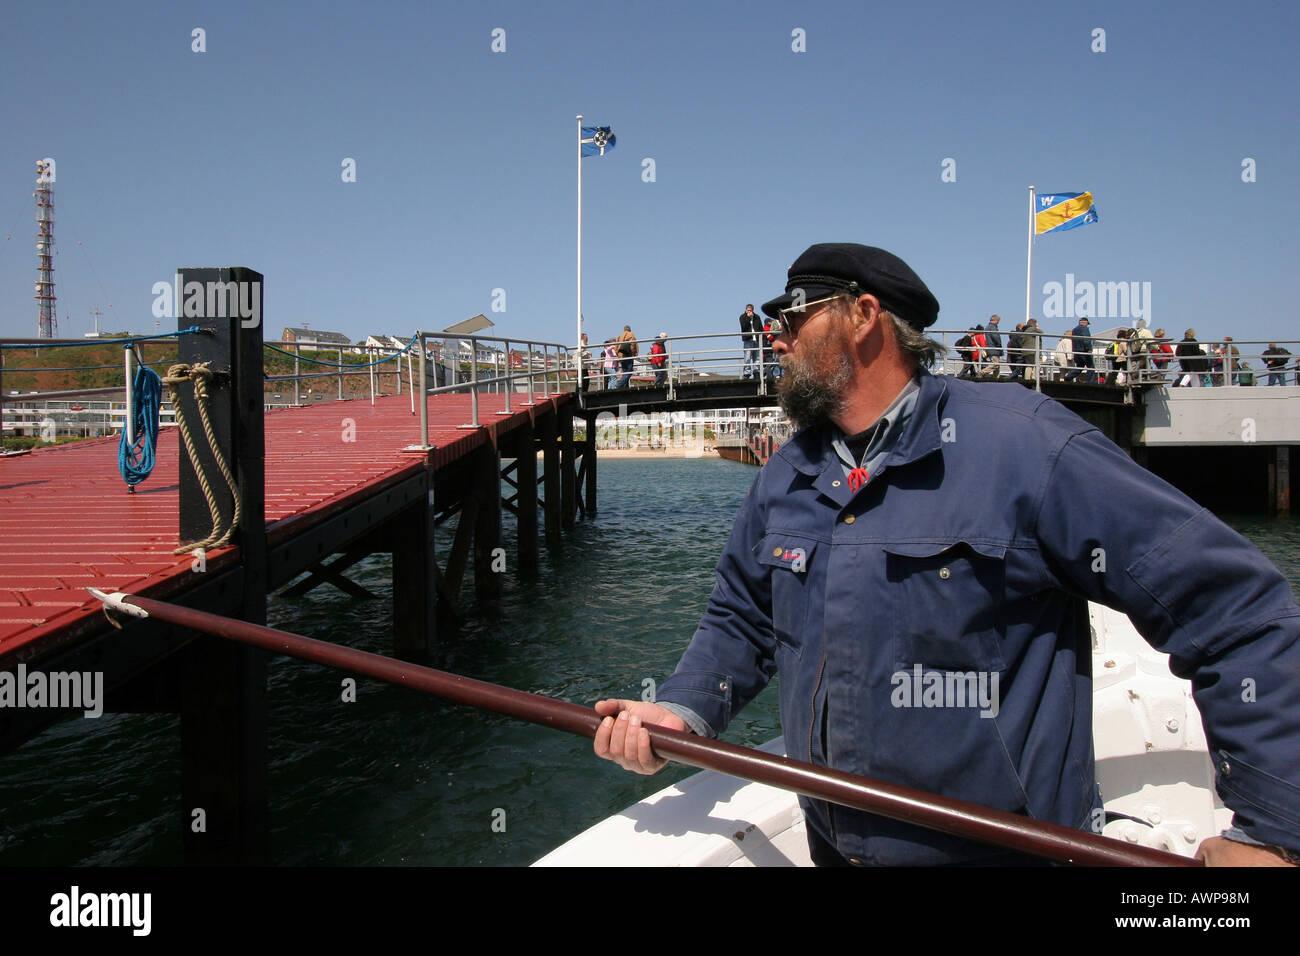 Boerte boat captain docking on deep-sea island Heligoland, Schleswig-Holstein, Germany, Europe - Stock Image